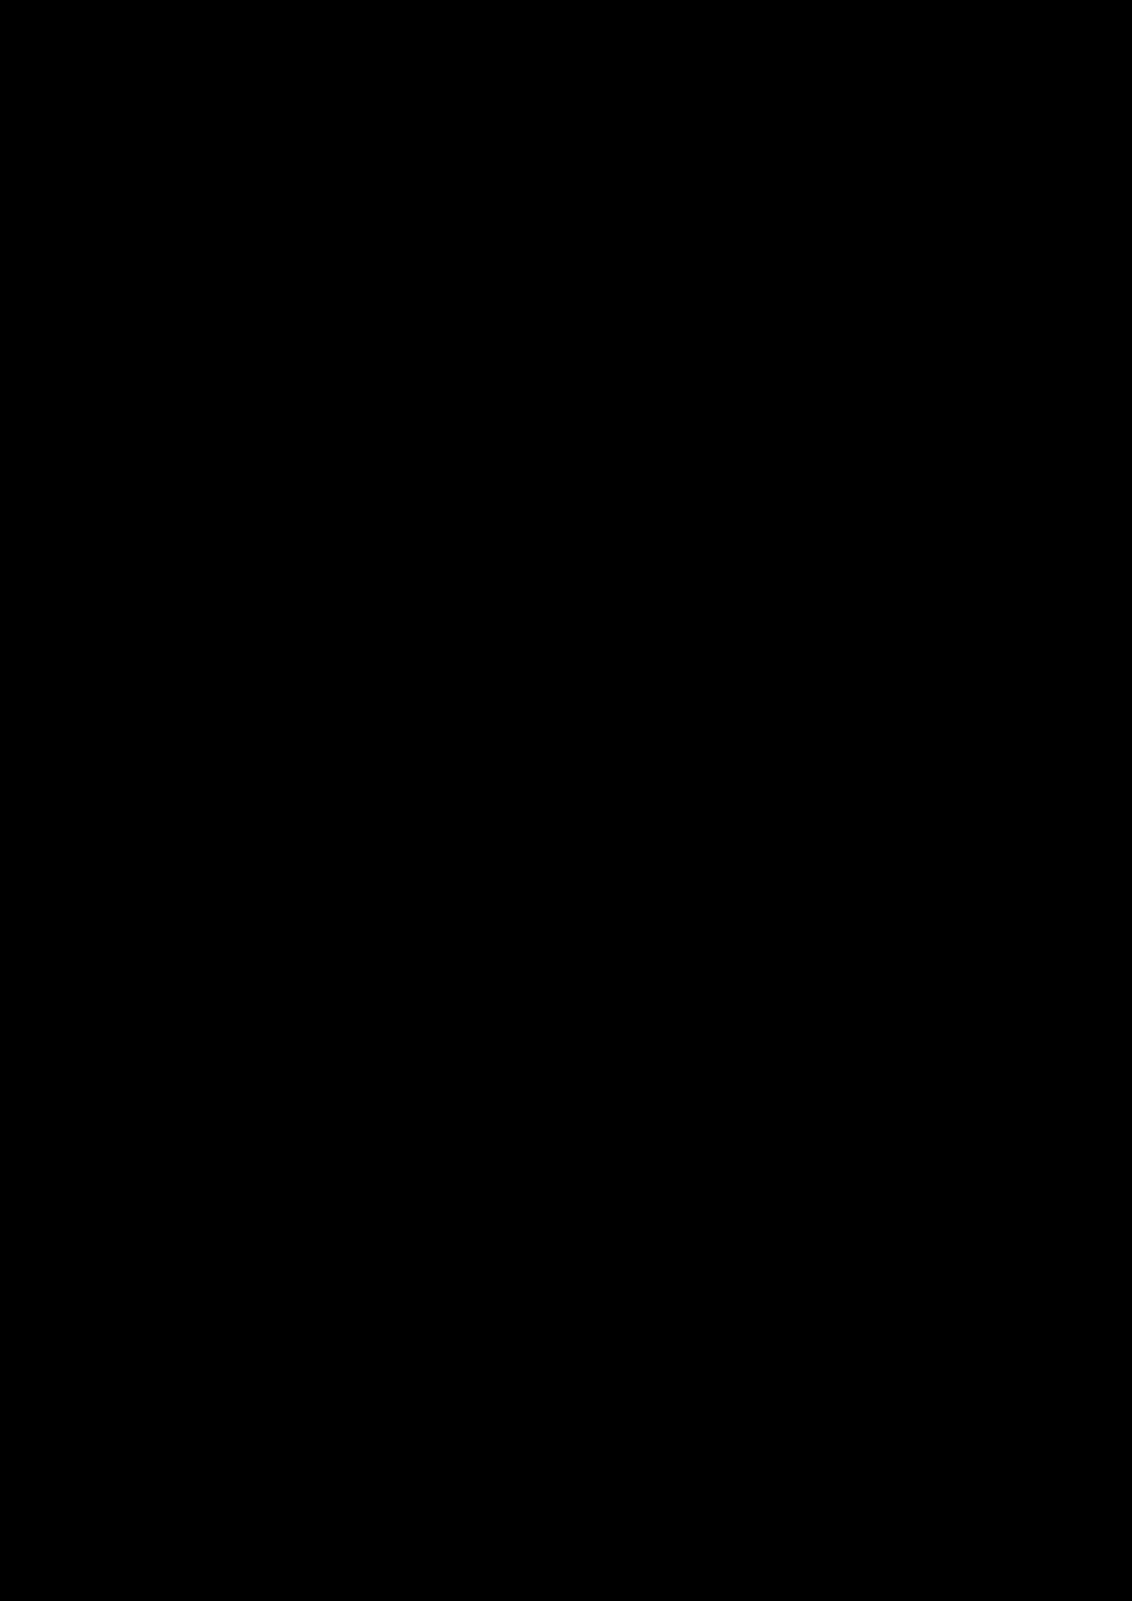 Prosti slide, Image 13